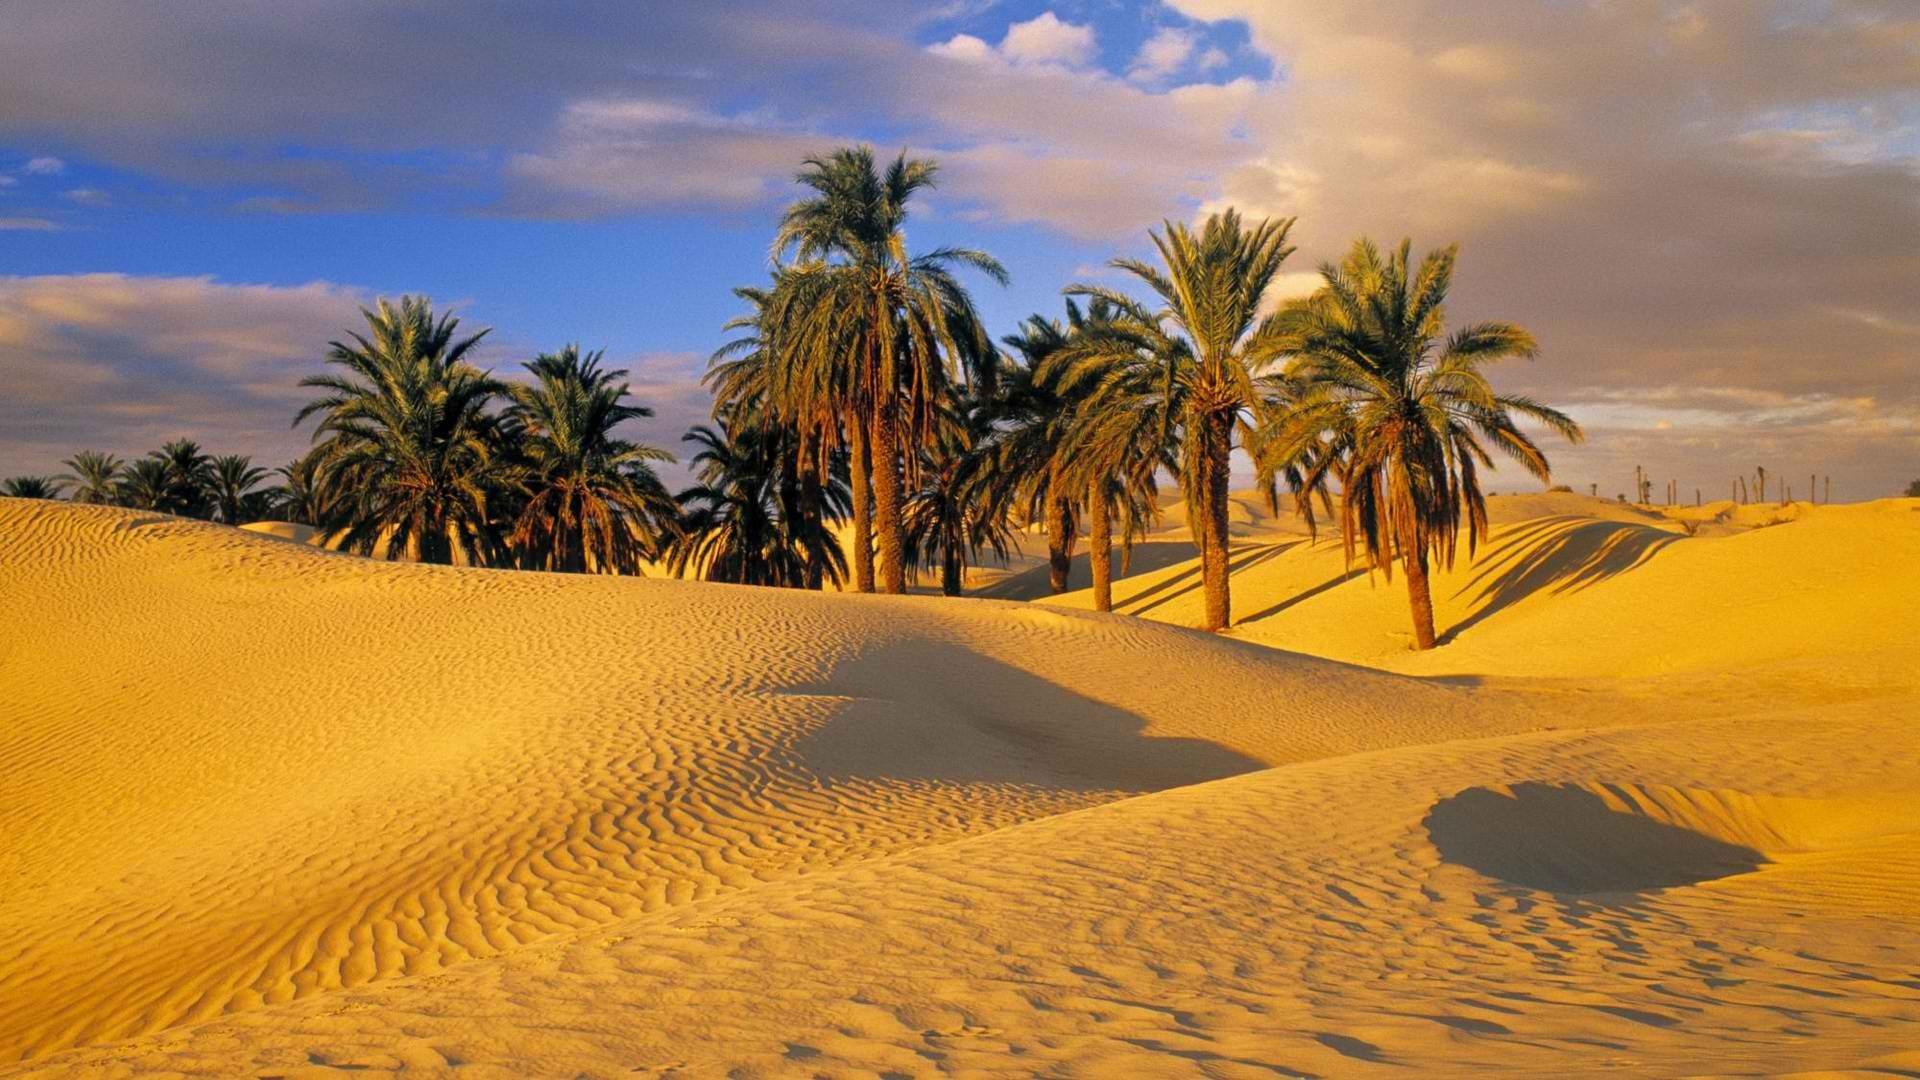 Desert; Desert; Desert; Desert; Desert ...